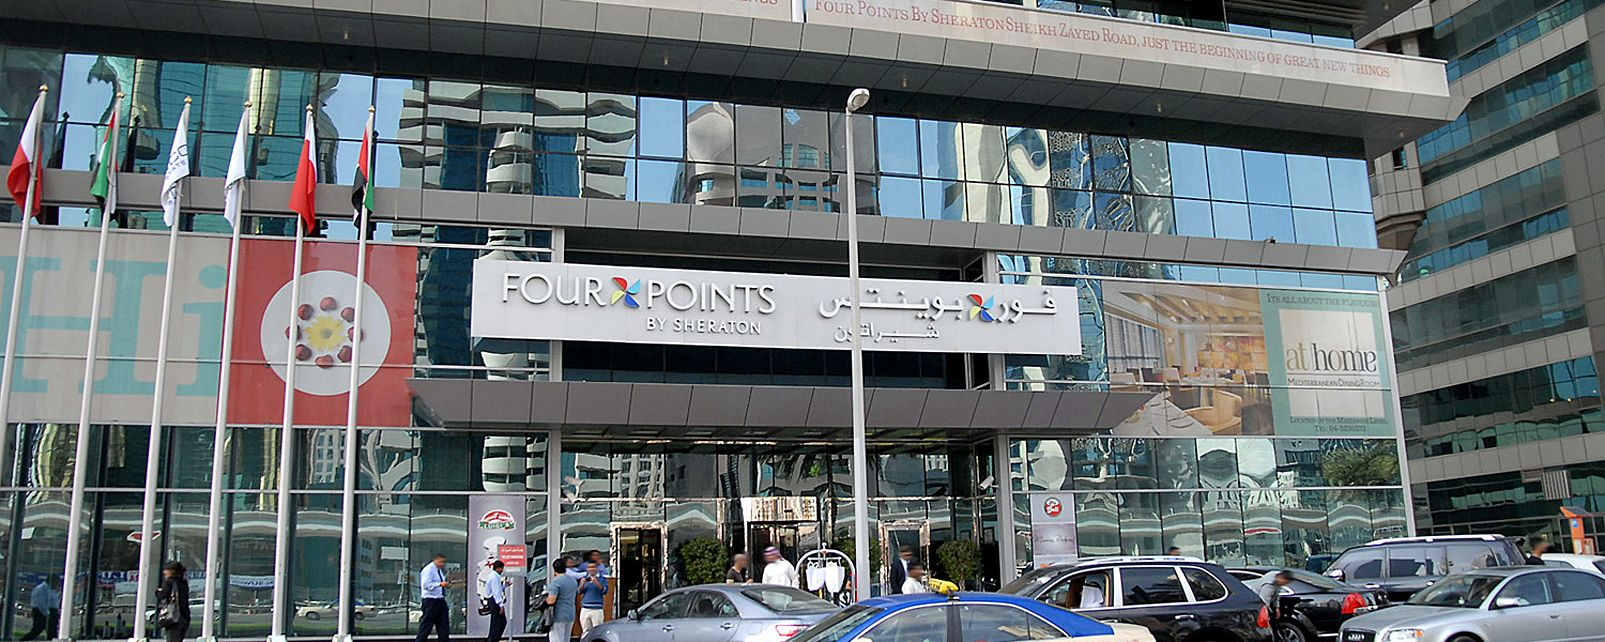 Hotel Four Points Sheikh Zayed Road by Sheraton